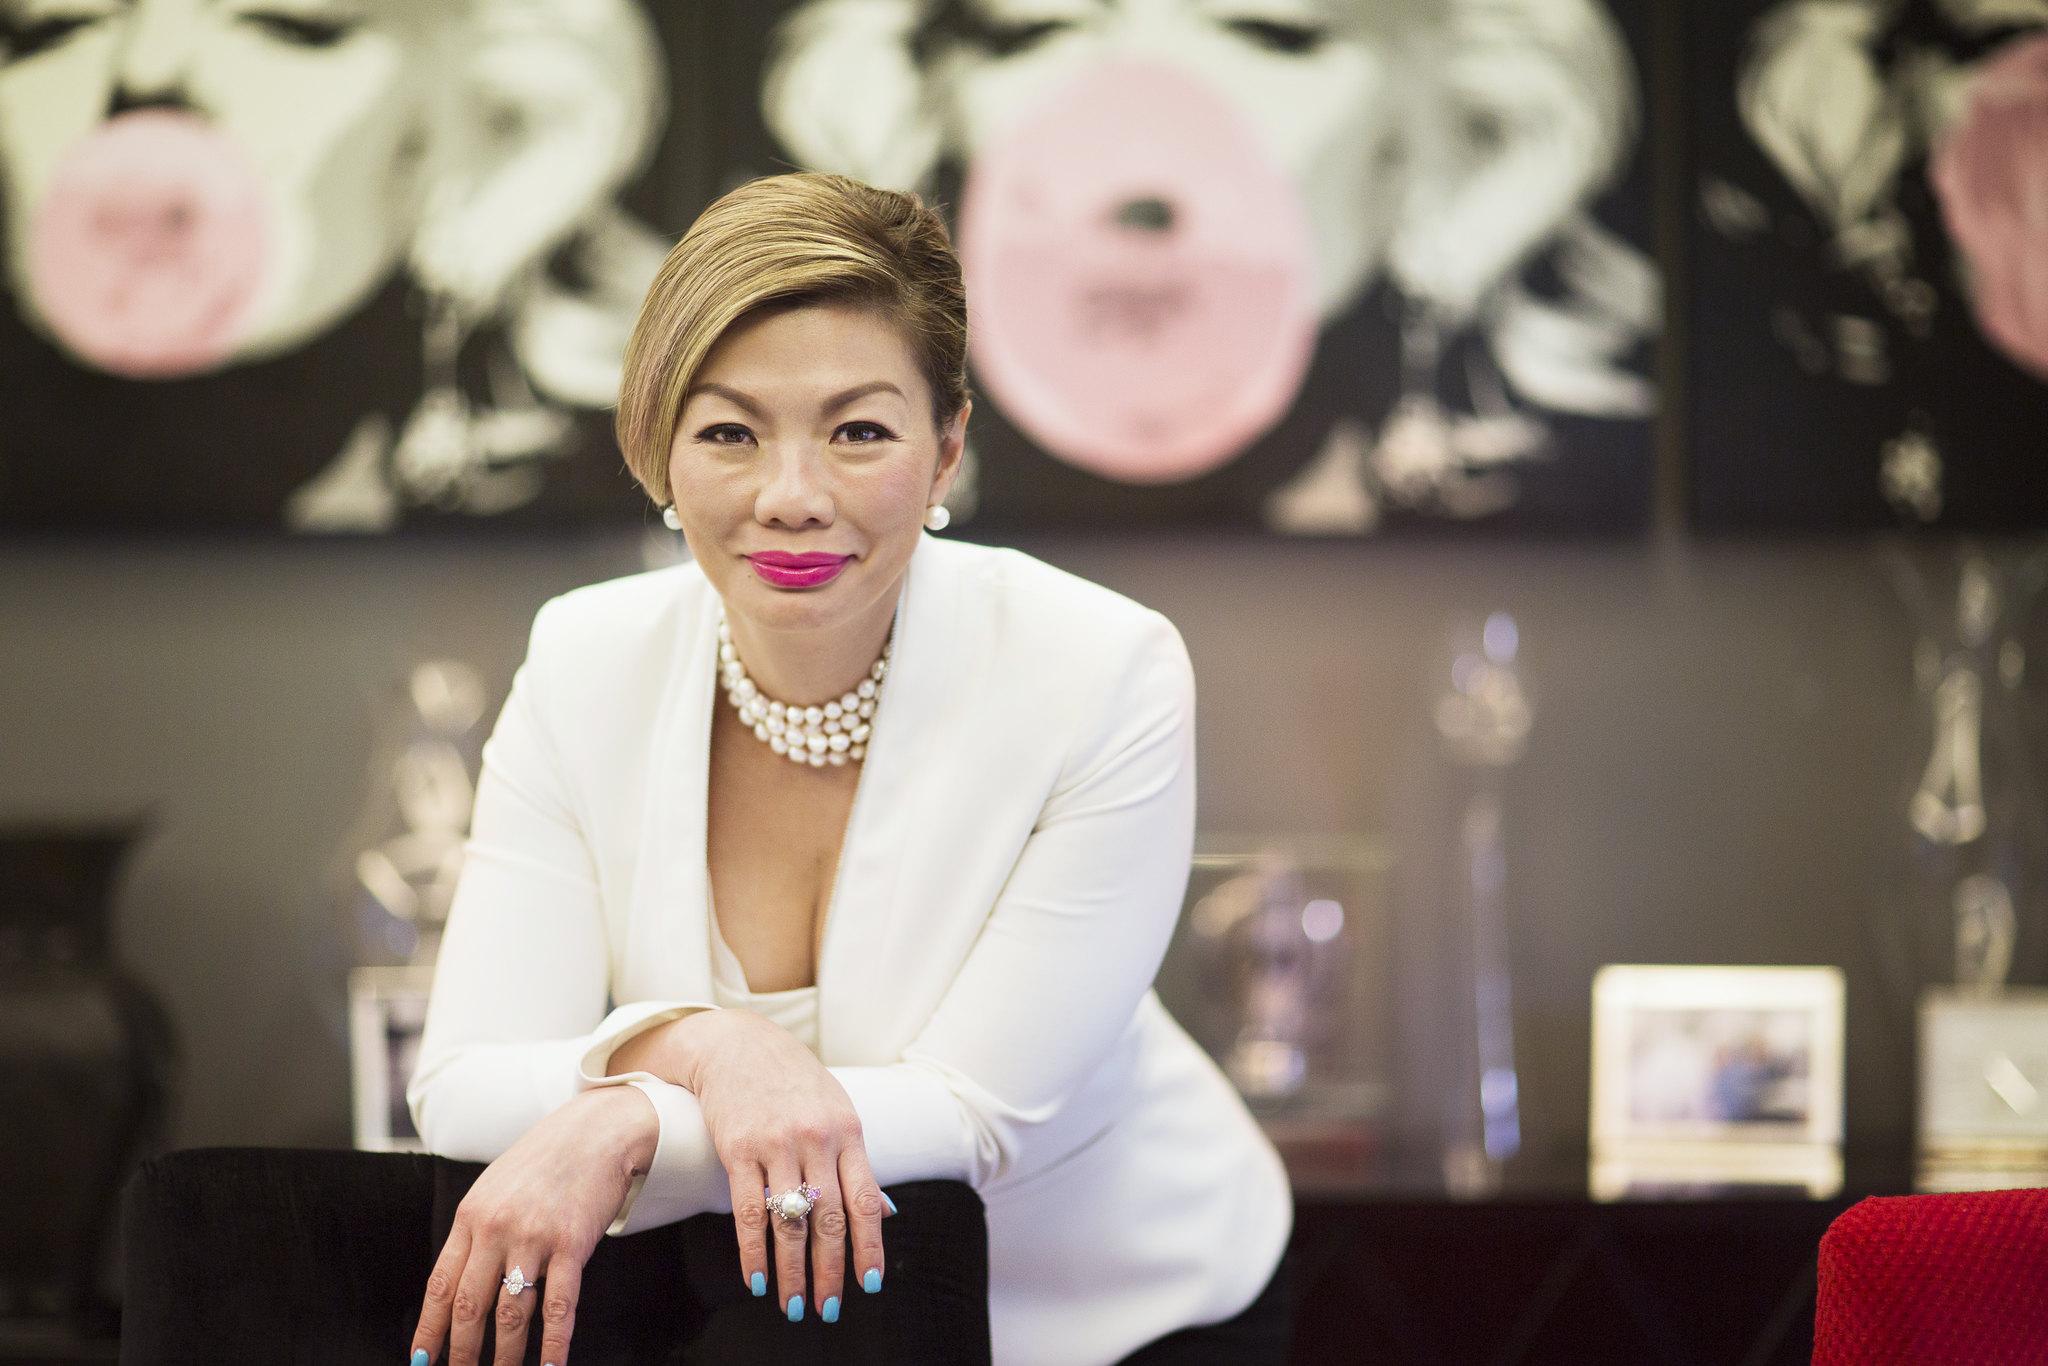 Stefanie Yuen-Thio